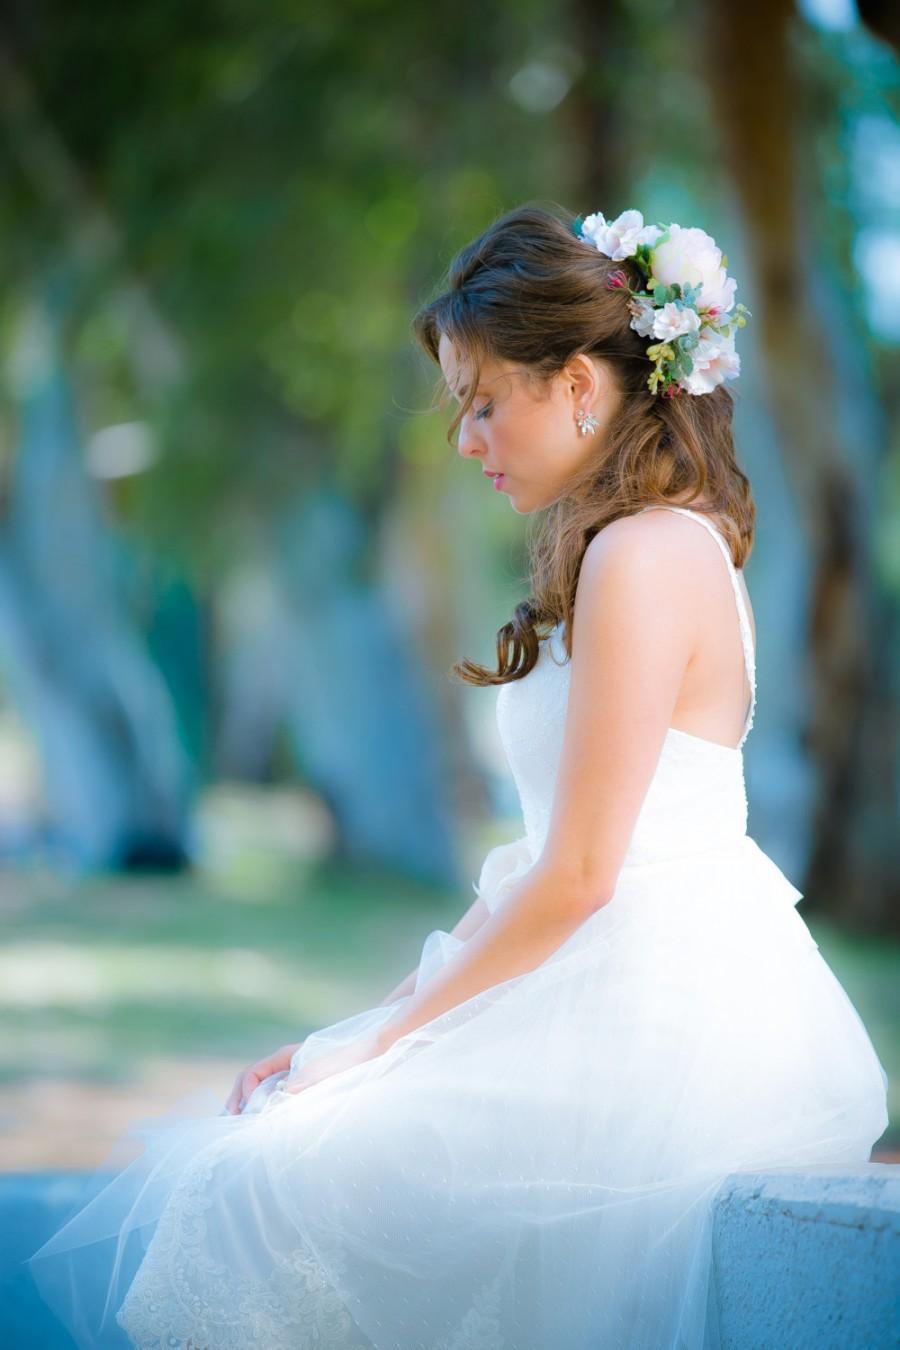 Mariage - Wedding flower headpiece, Bohemian flower crown, Bridal hair accessories, Rustic Wedding Bride Headpiece, Boho wedding Halo,  flower crown